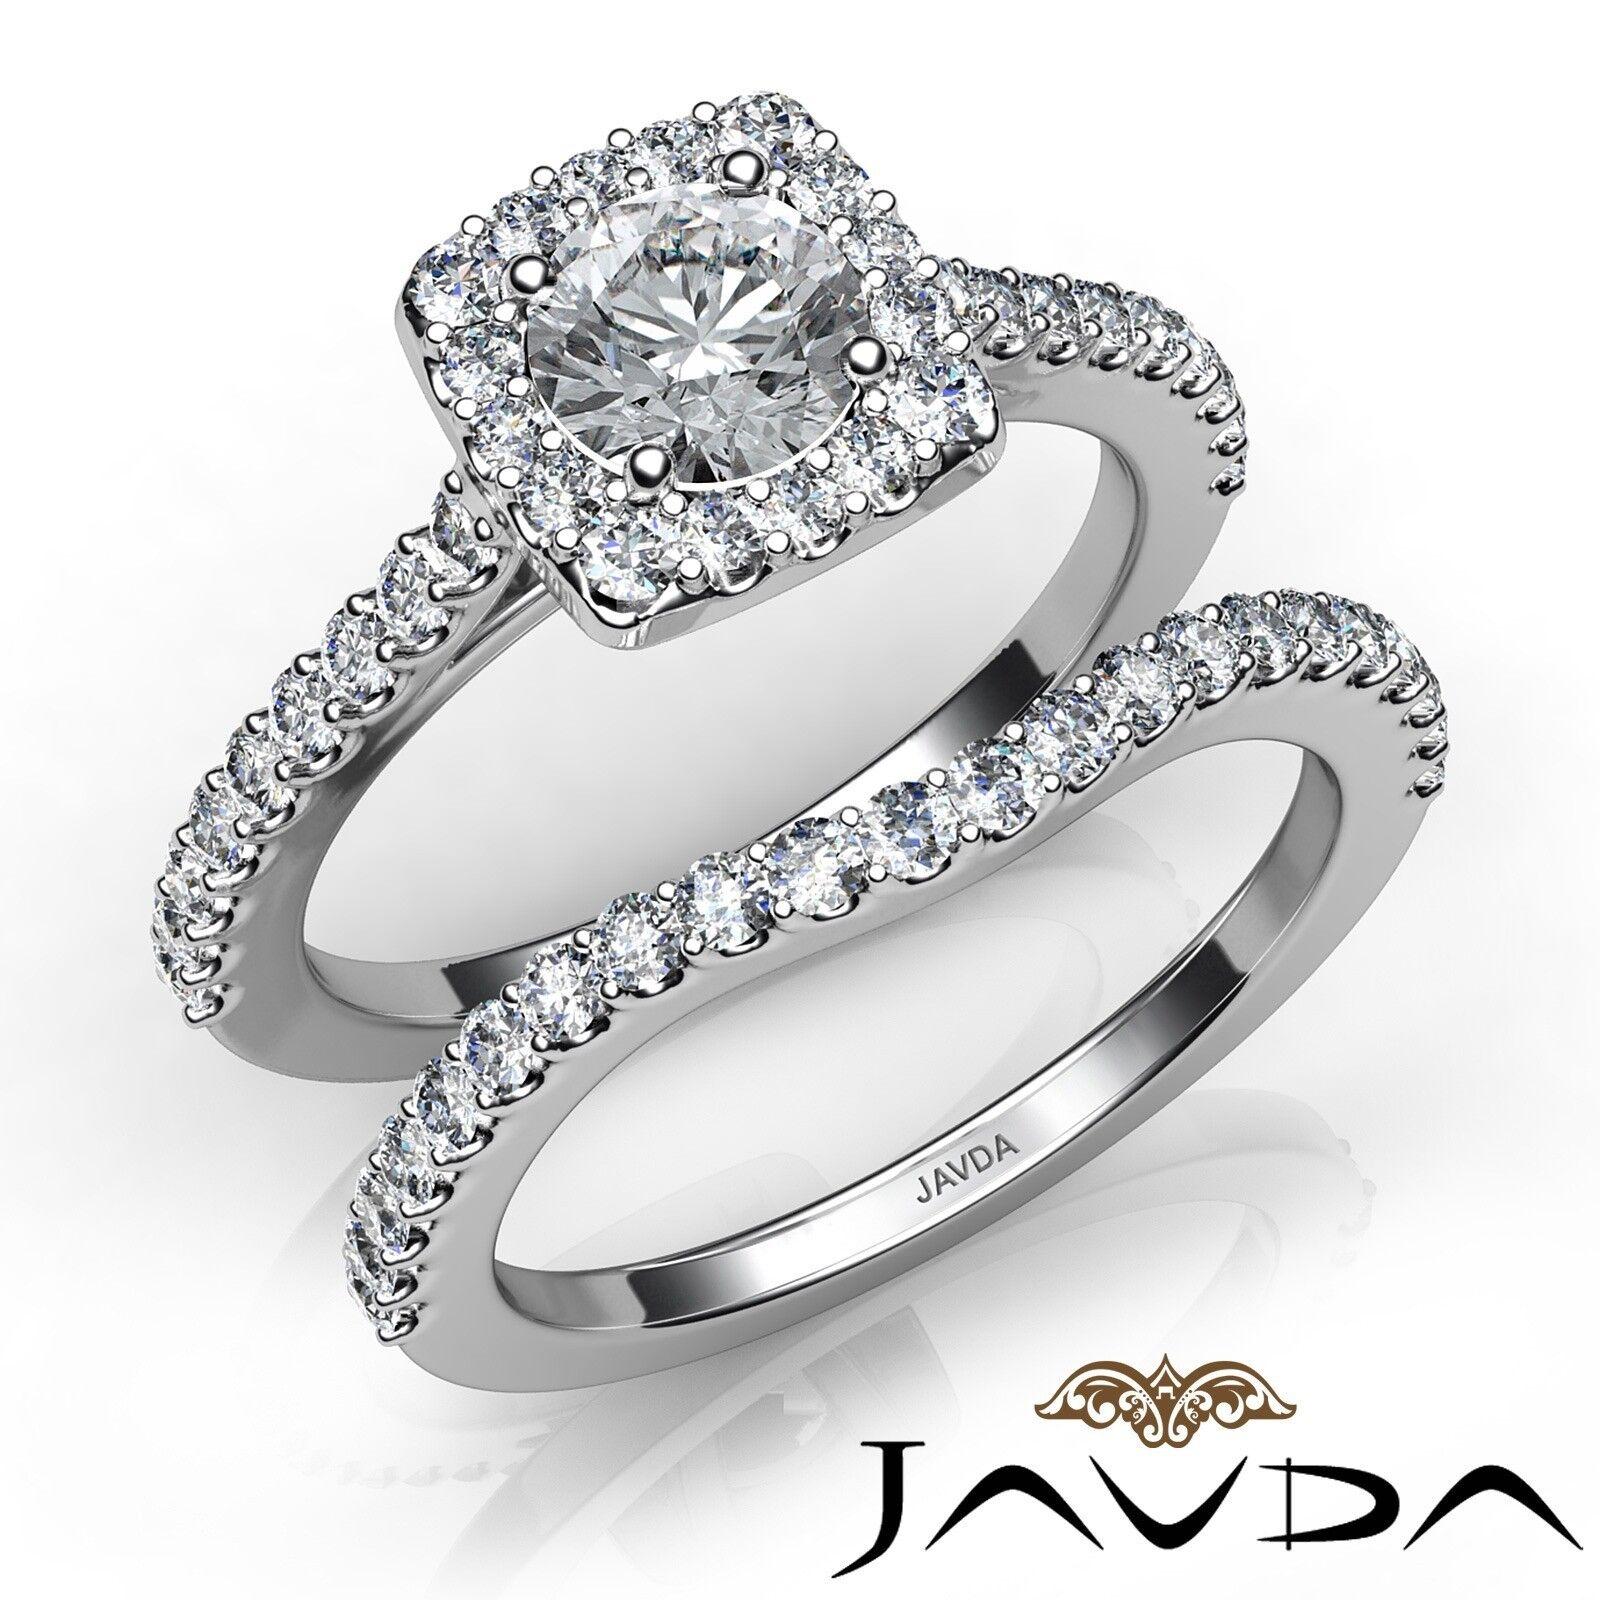 1.5ct Halo U Prong Bridal Set Round Diamond Engagement Ring GIA F-VS1 White Gold